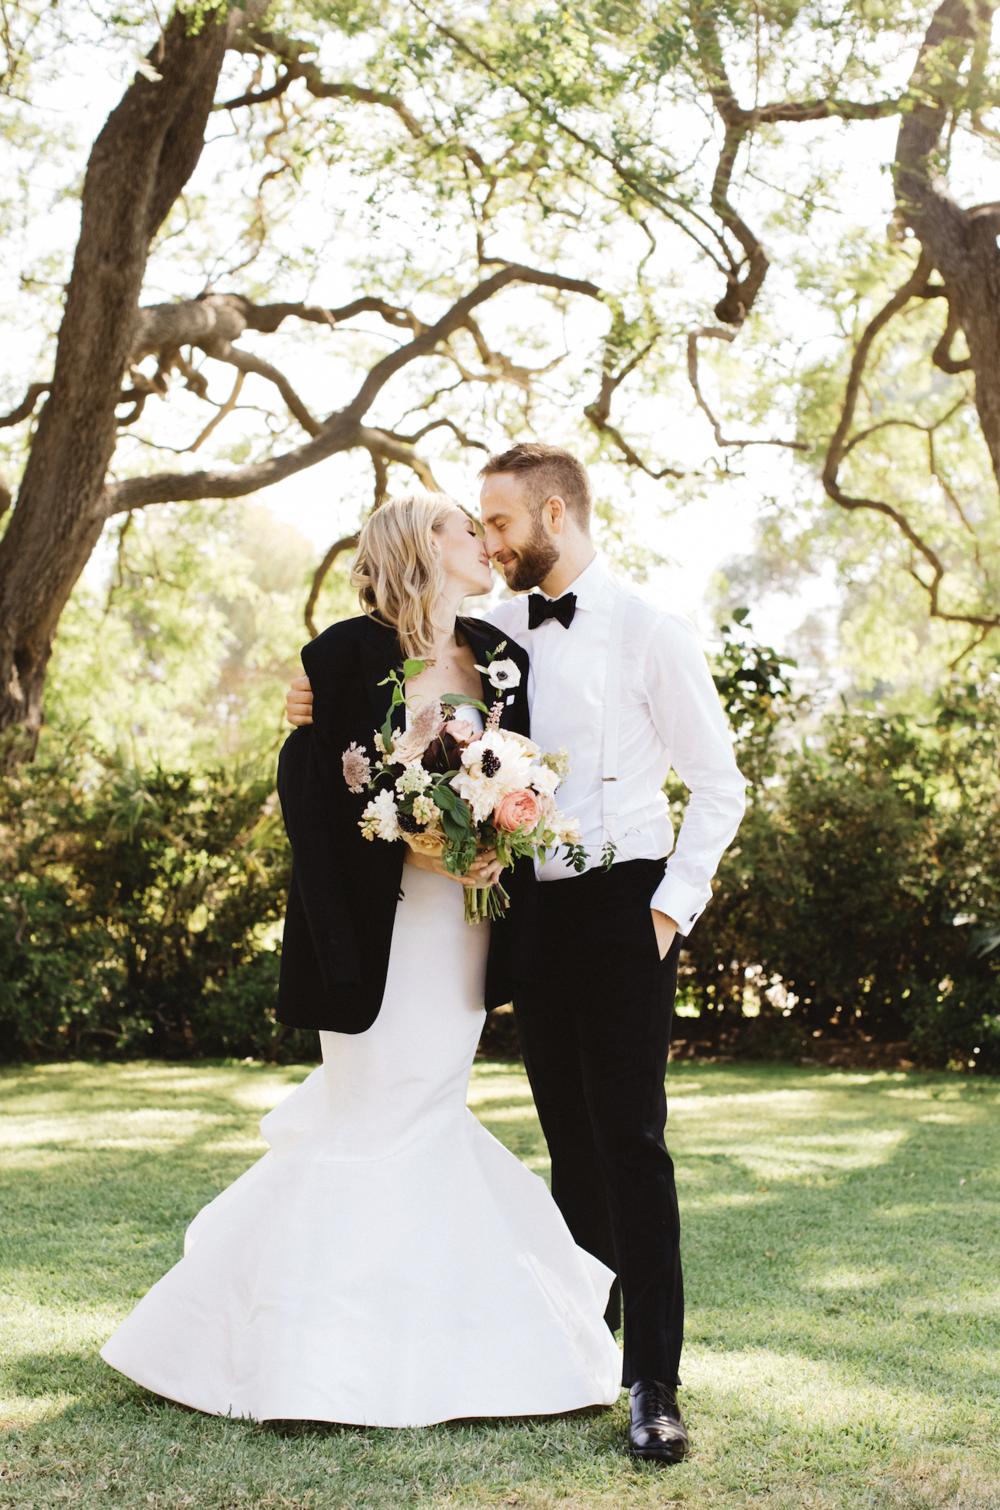 HAILLEY+HOWARD+DESTINATION+WEDDING+PHOTOGRAPHER_+WEDDING+PHOTOGRAPHER+LOS+ANGELES.png